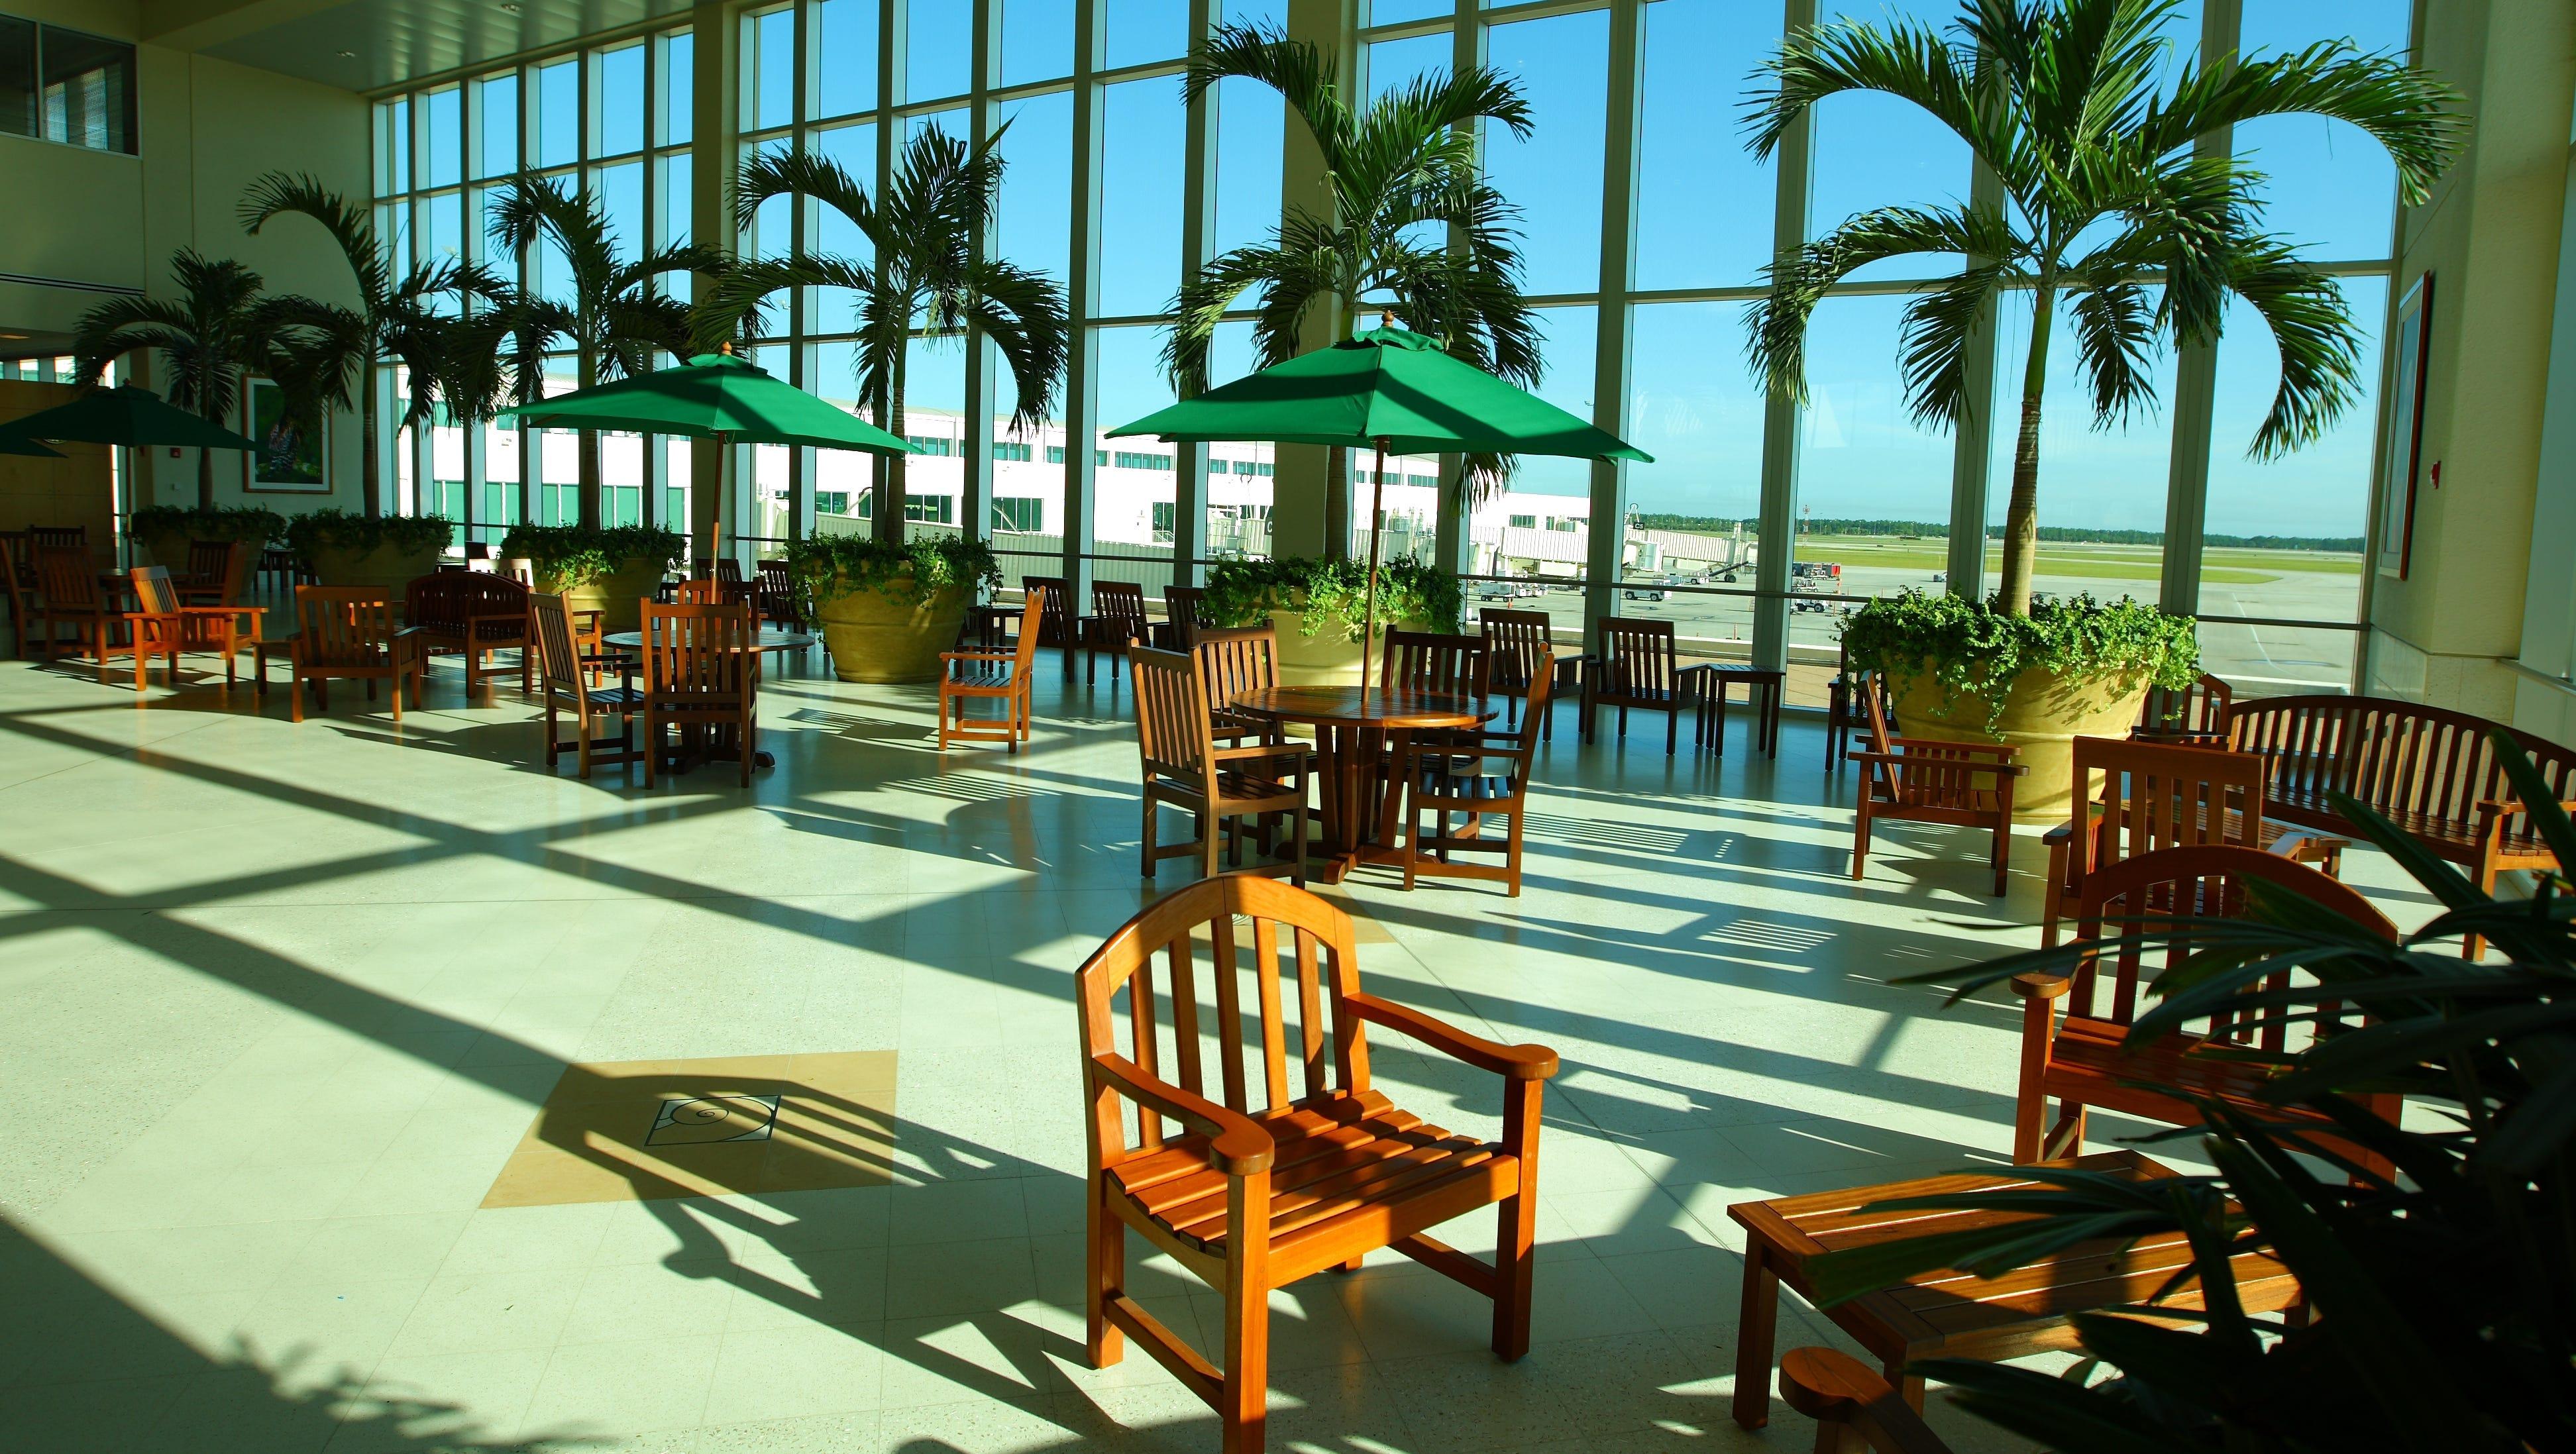 Southwest Florida International Airport Guide